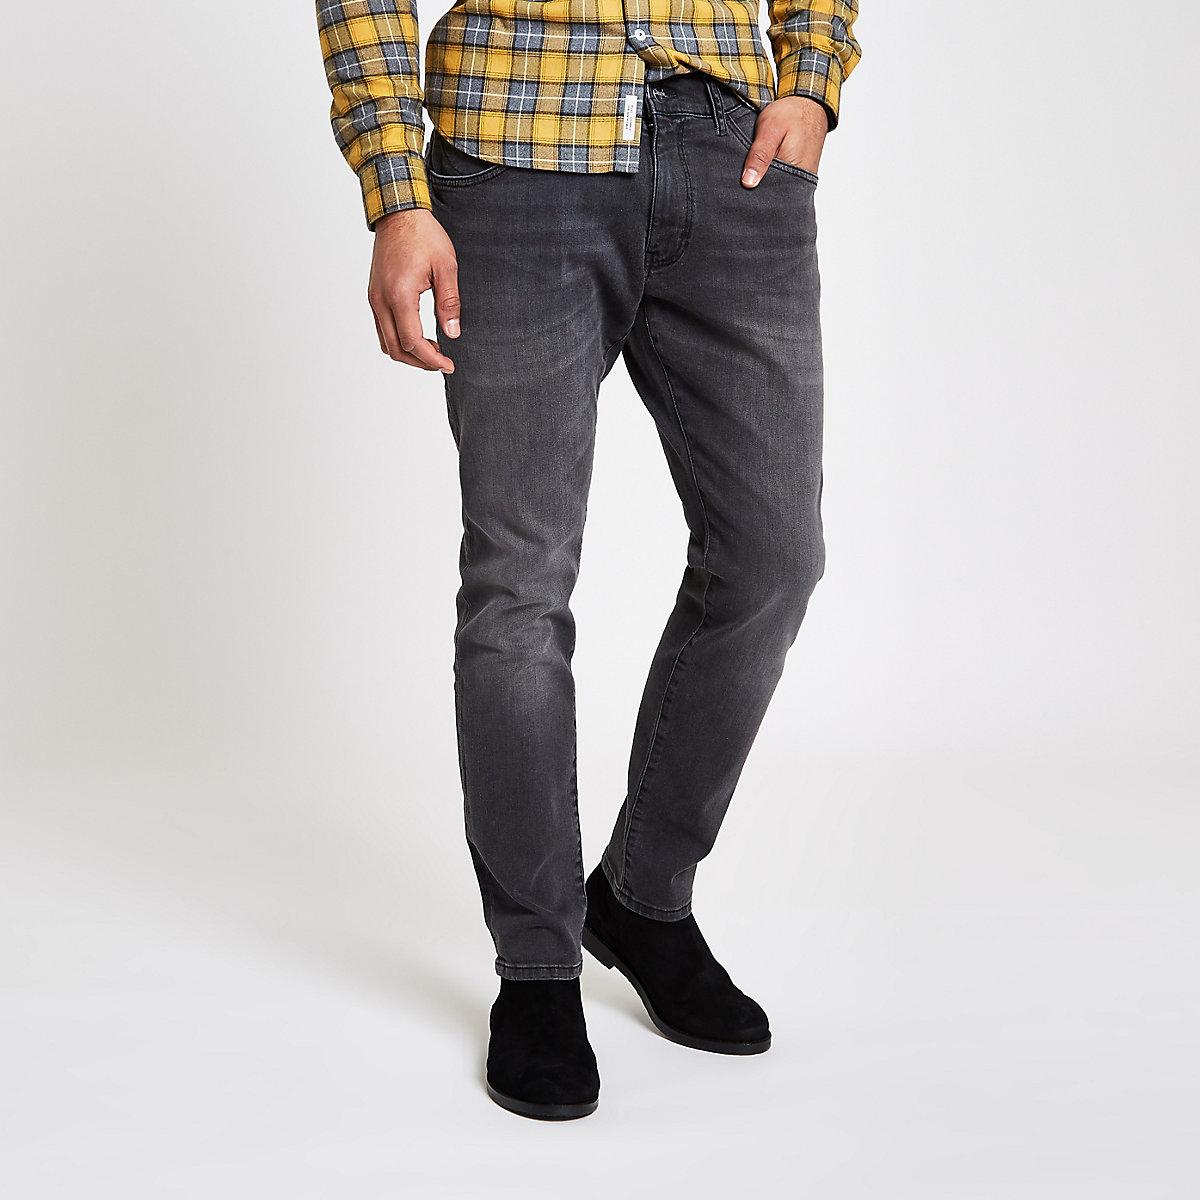 Wrangler grey Bryson skinny fit jeans